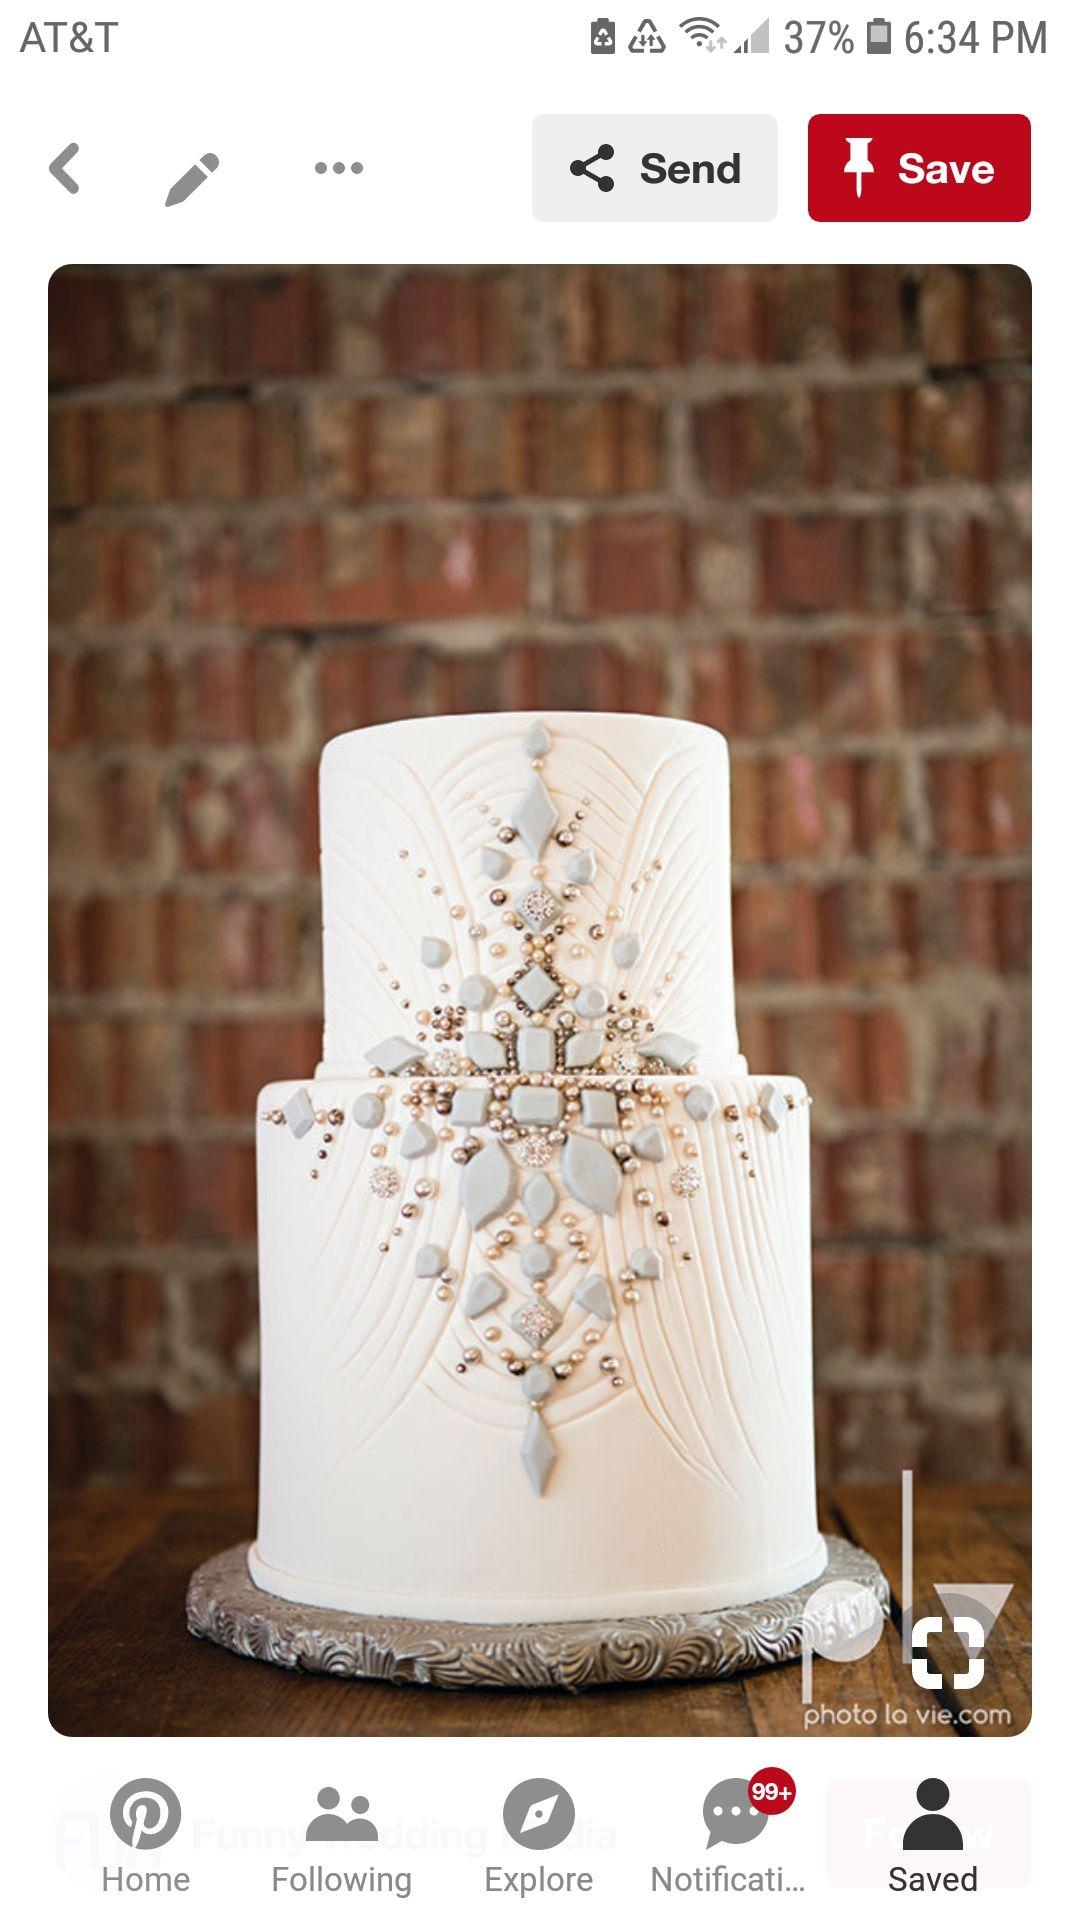 1920s wedding decoration ideas  Pin by Elizabeth Clogston on JCus wedding  Pinterest  Wedding